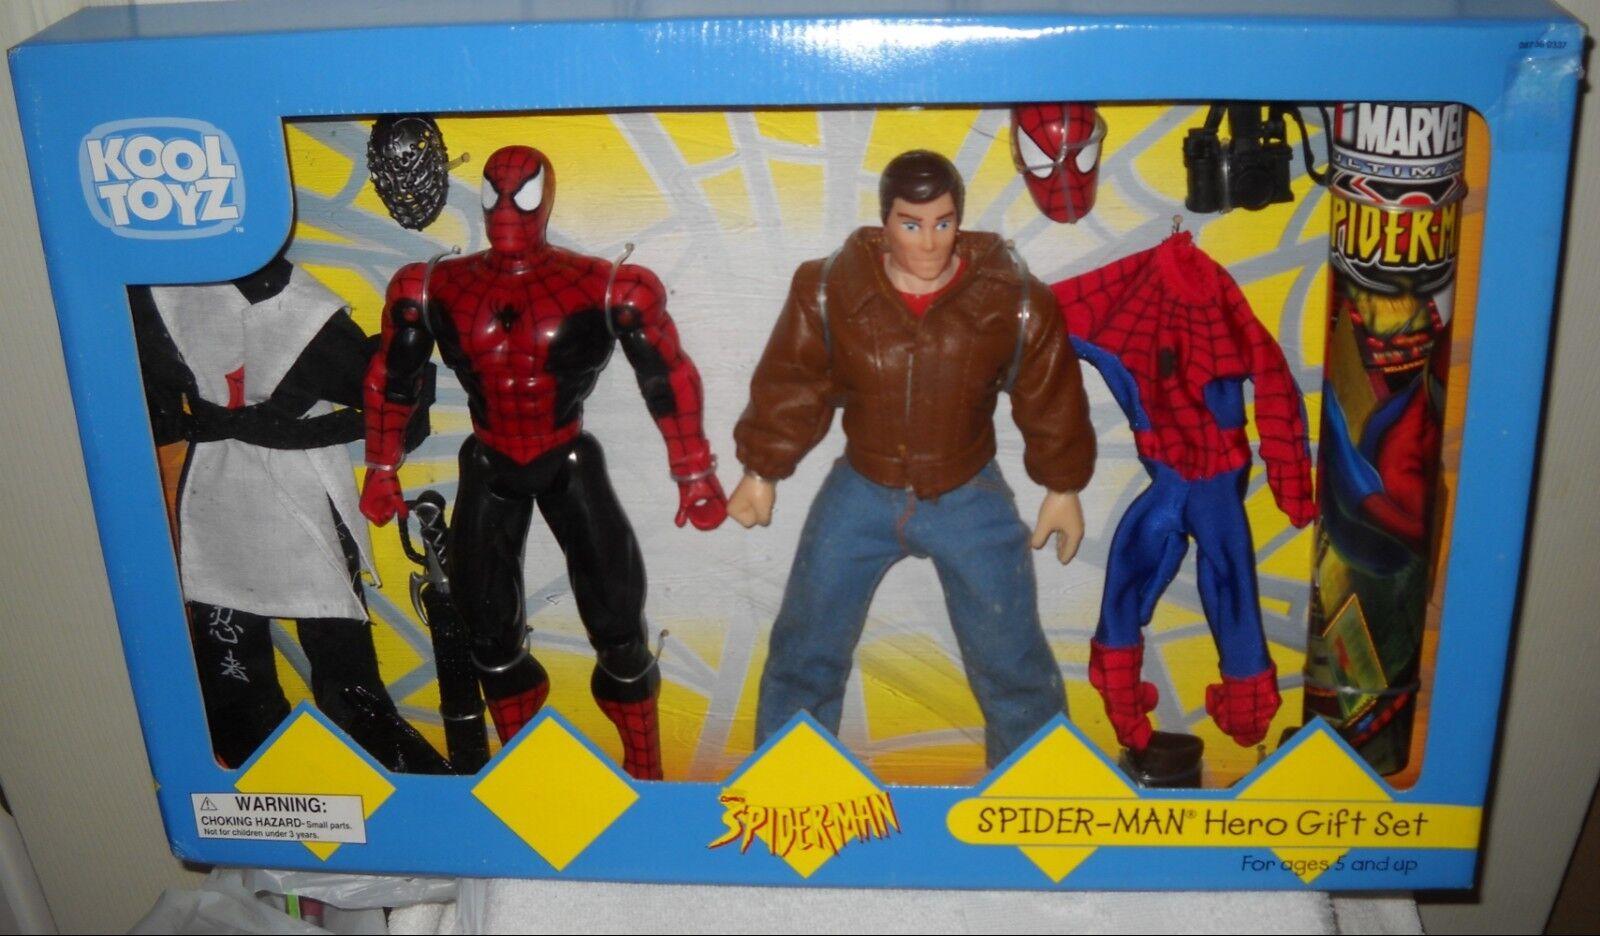 9980 RARE NRFB Toy Biz Kool Toyz Target Stores 2001 Spider-man Hero Giftset